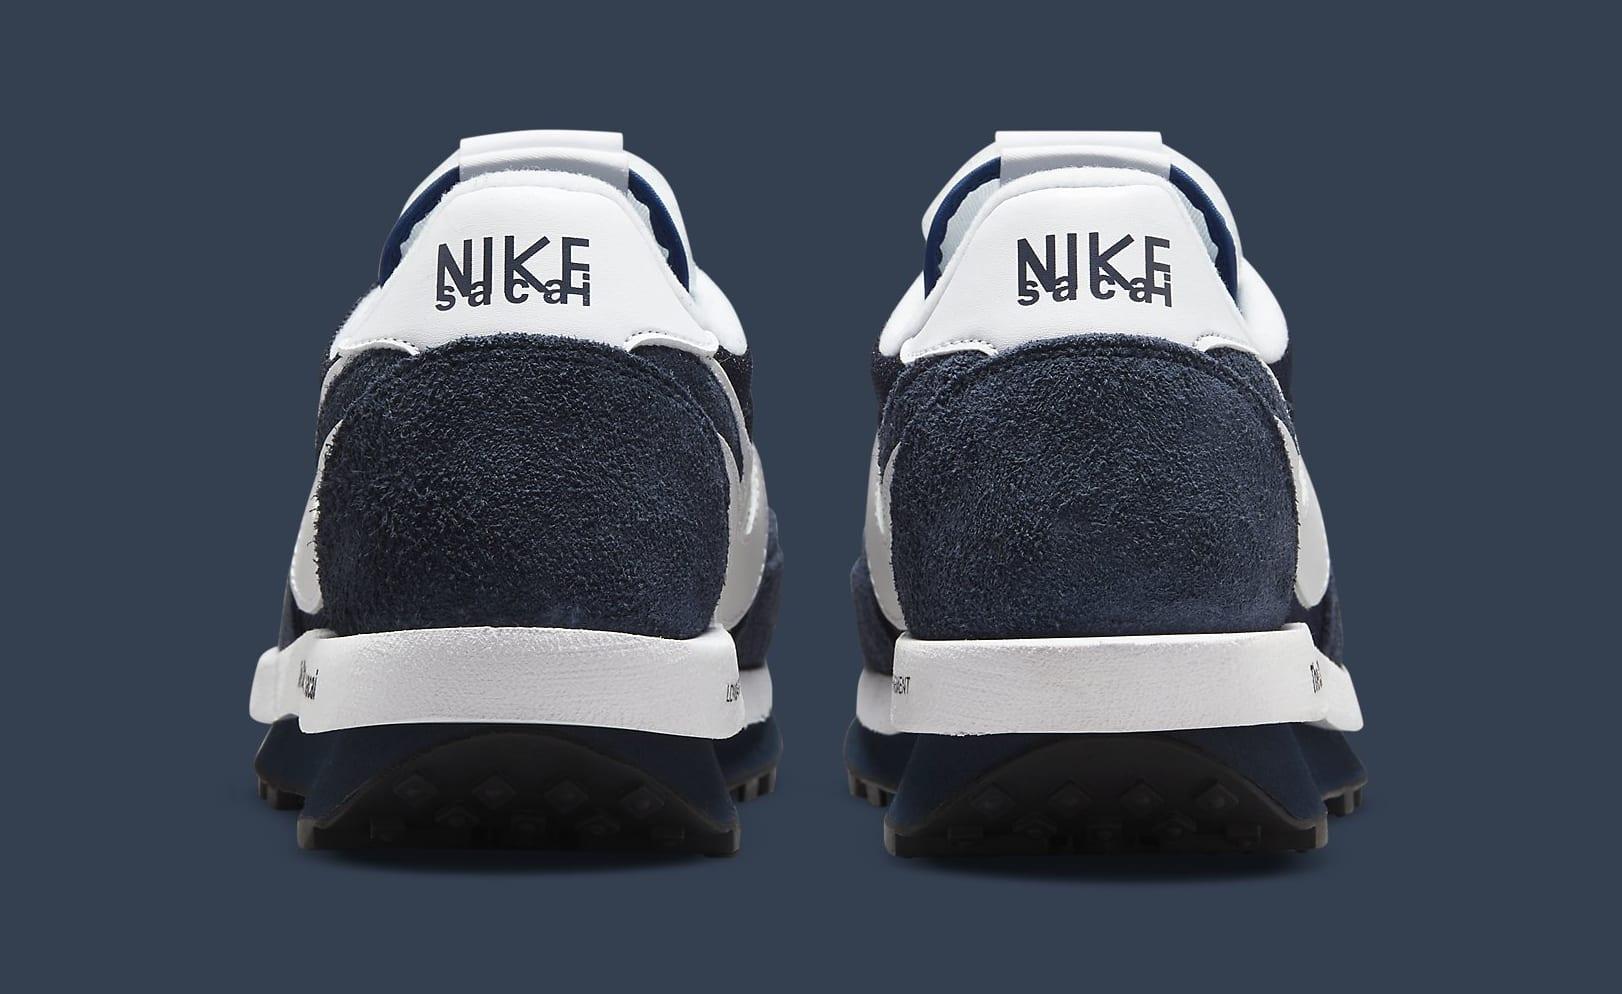 Fragment x Sacai x Nike LDWaffle 'Blackened Blue' DH2684-400 Heel